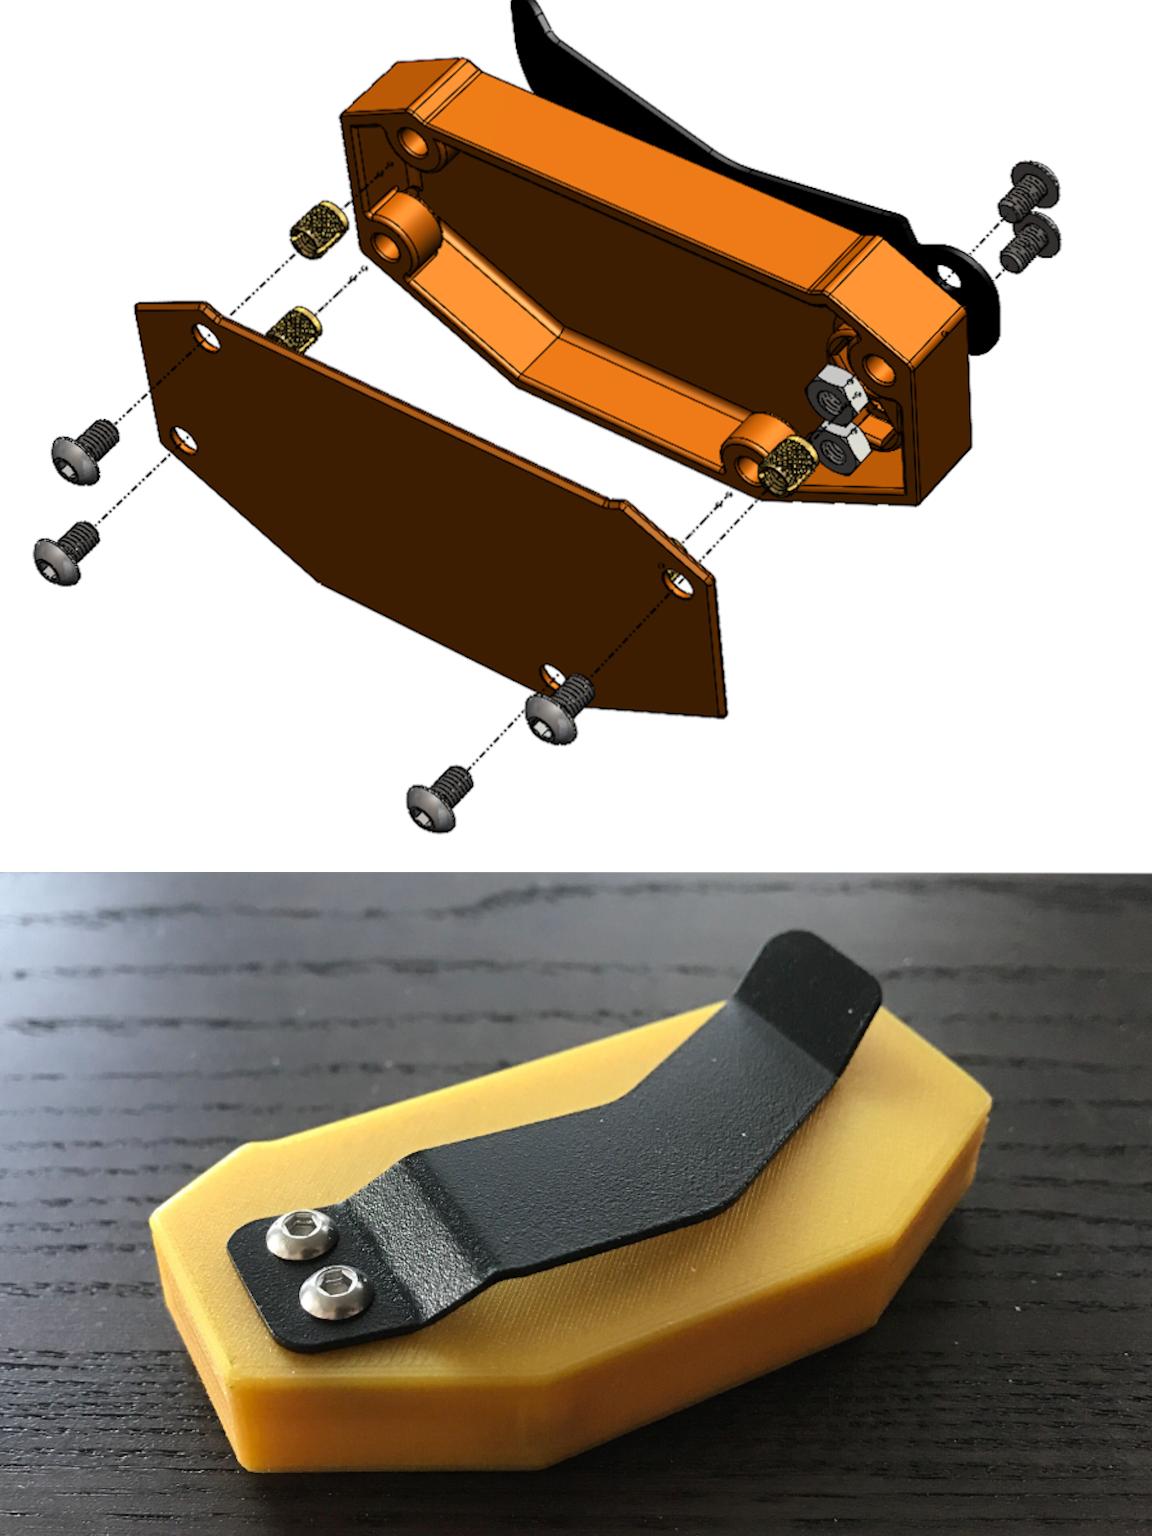 Integrating 3D Printing and Sheet Metal